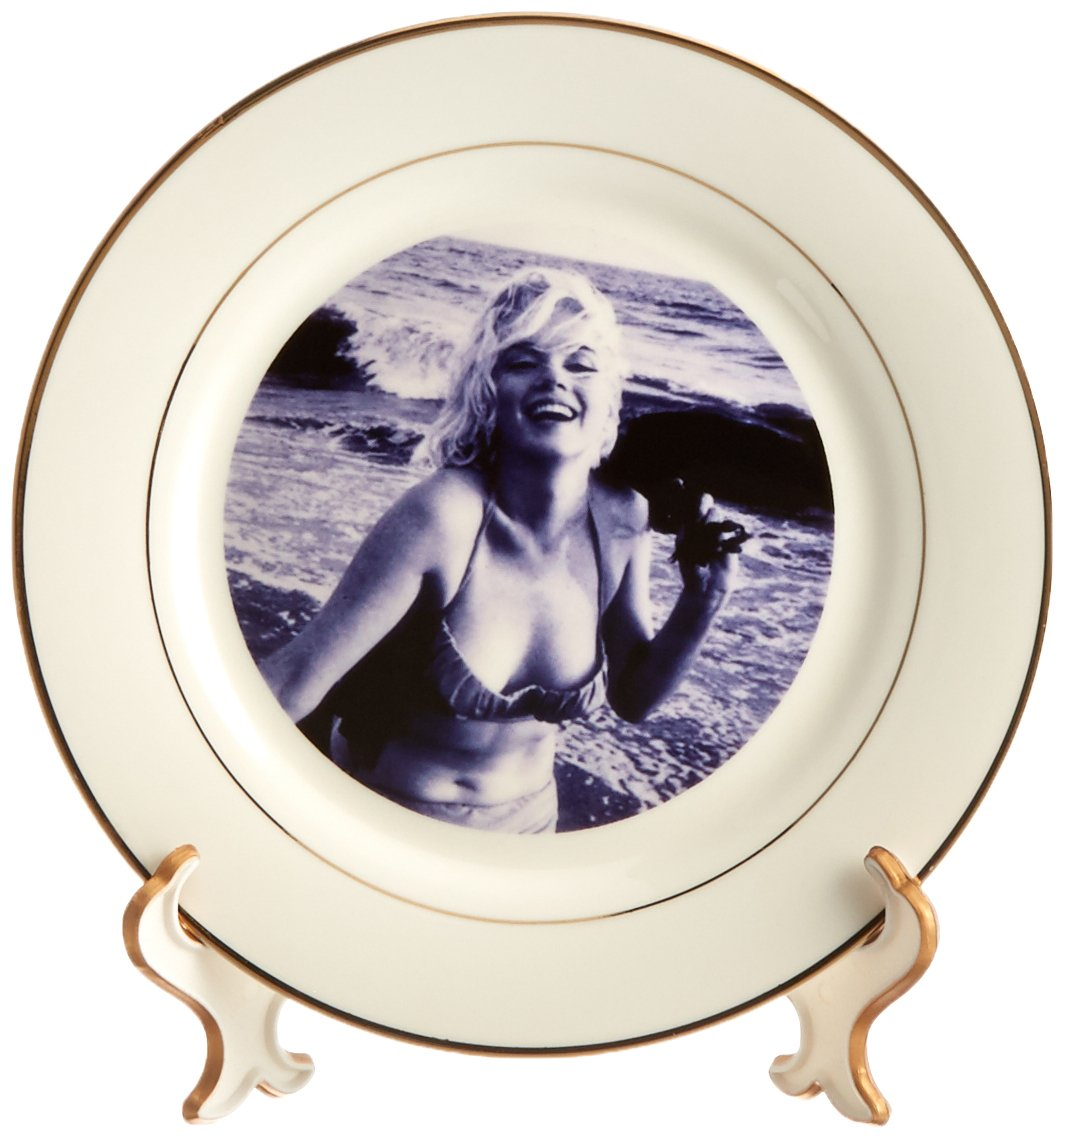 3dRose cp/_107190/_1 Marilyn Monroe at The Beach-Porcelain Plate 8-Inch